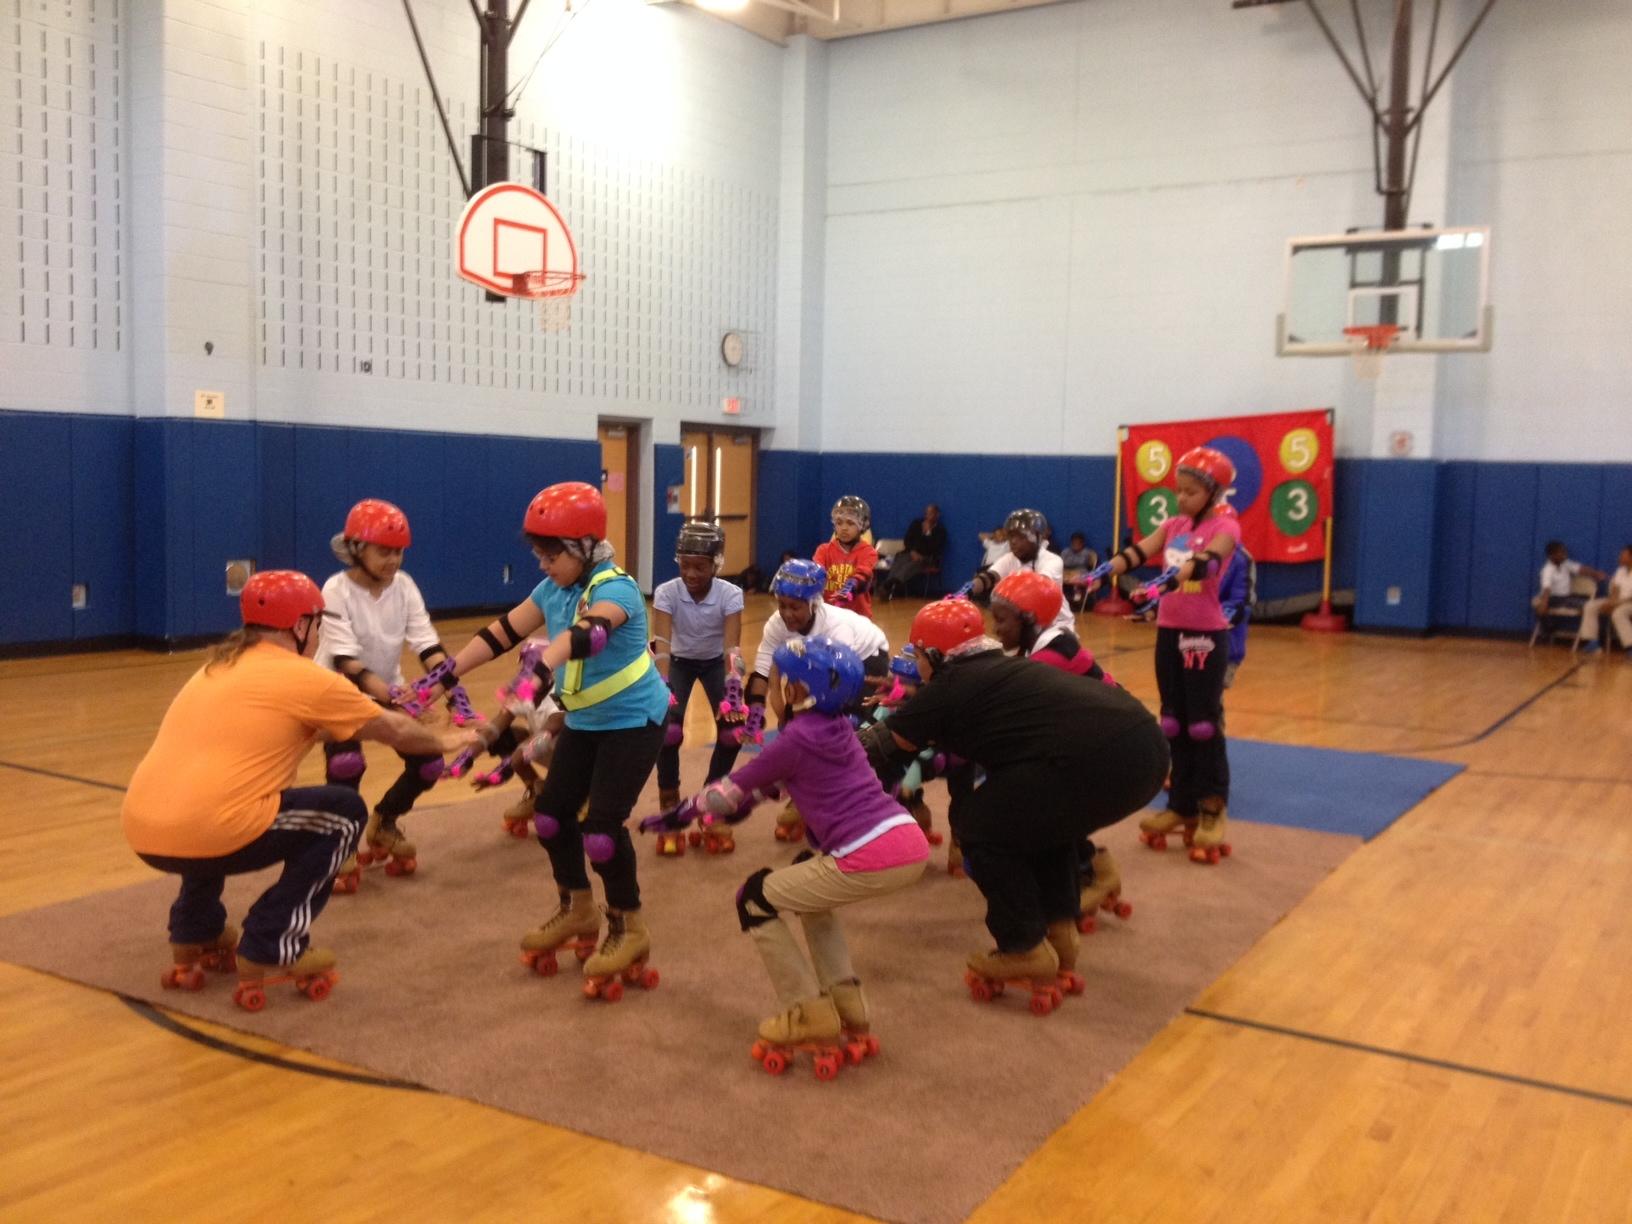 Roller skating rink woodbridge nj - Bradley School 4th Graders Learn To Roller Skate